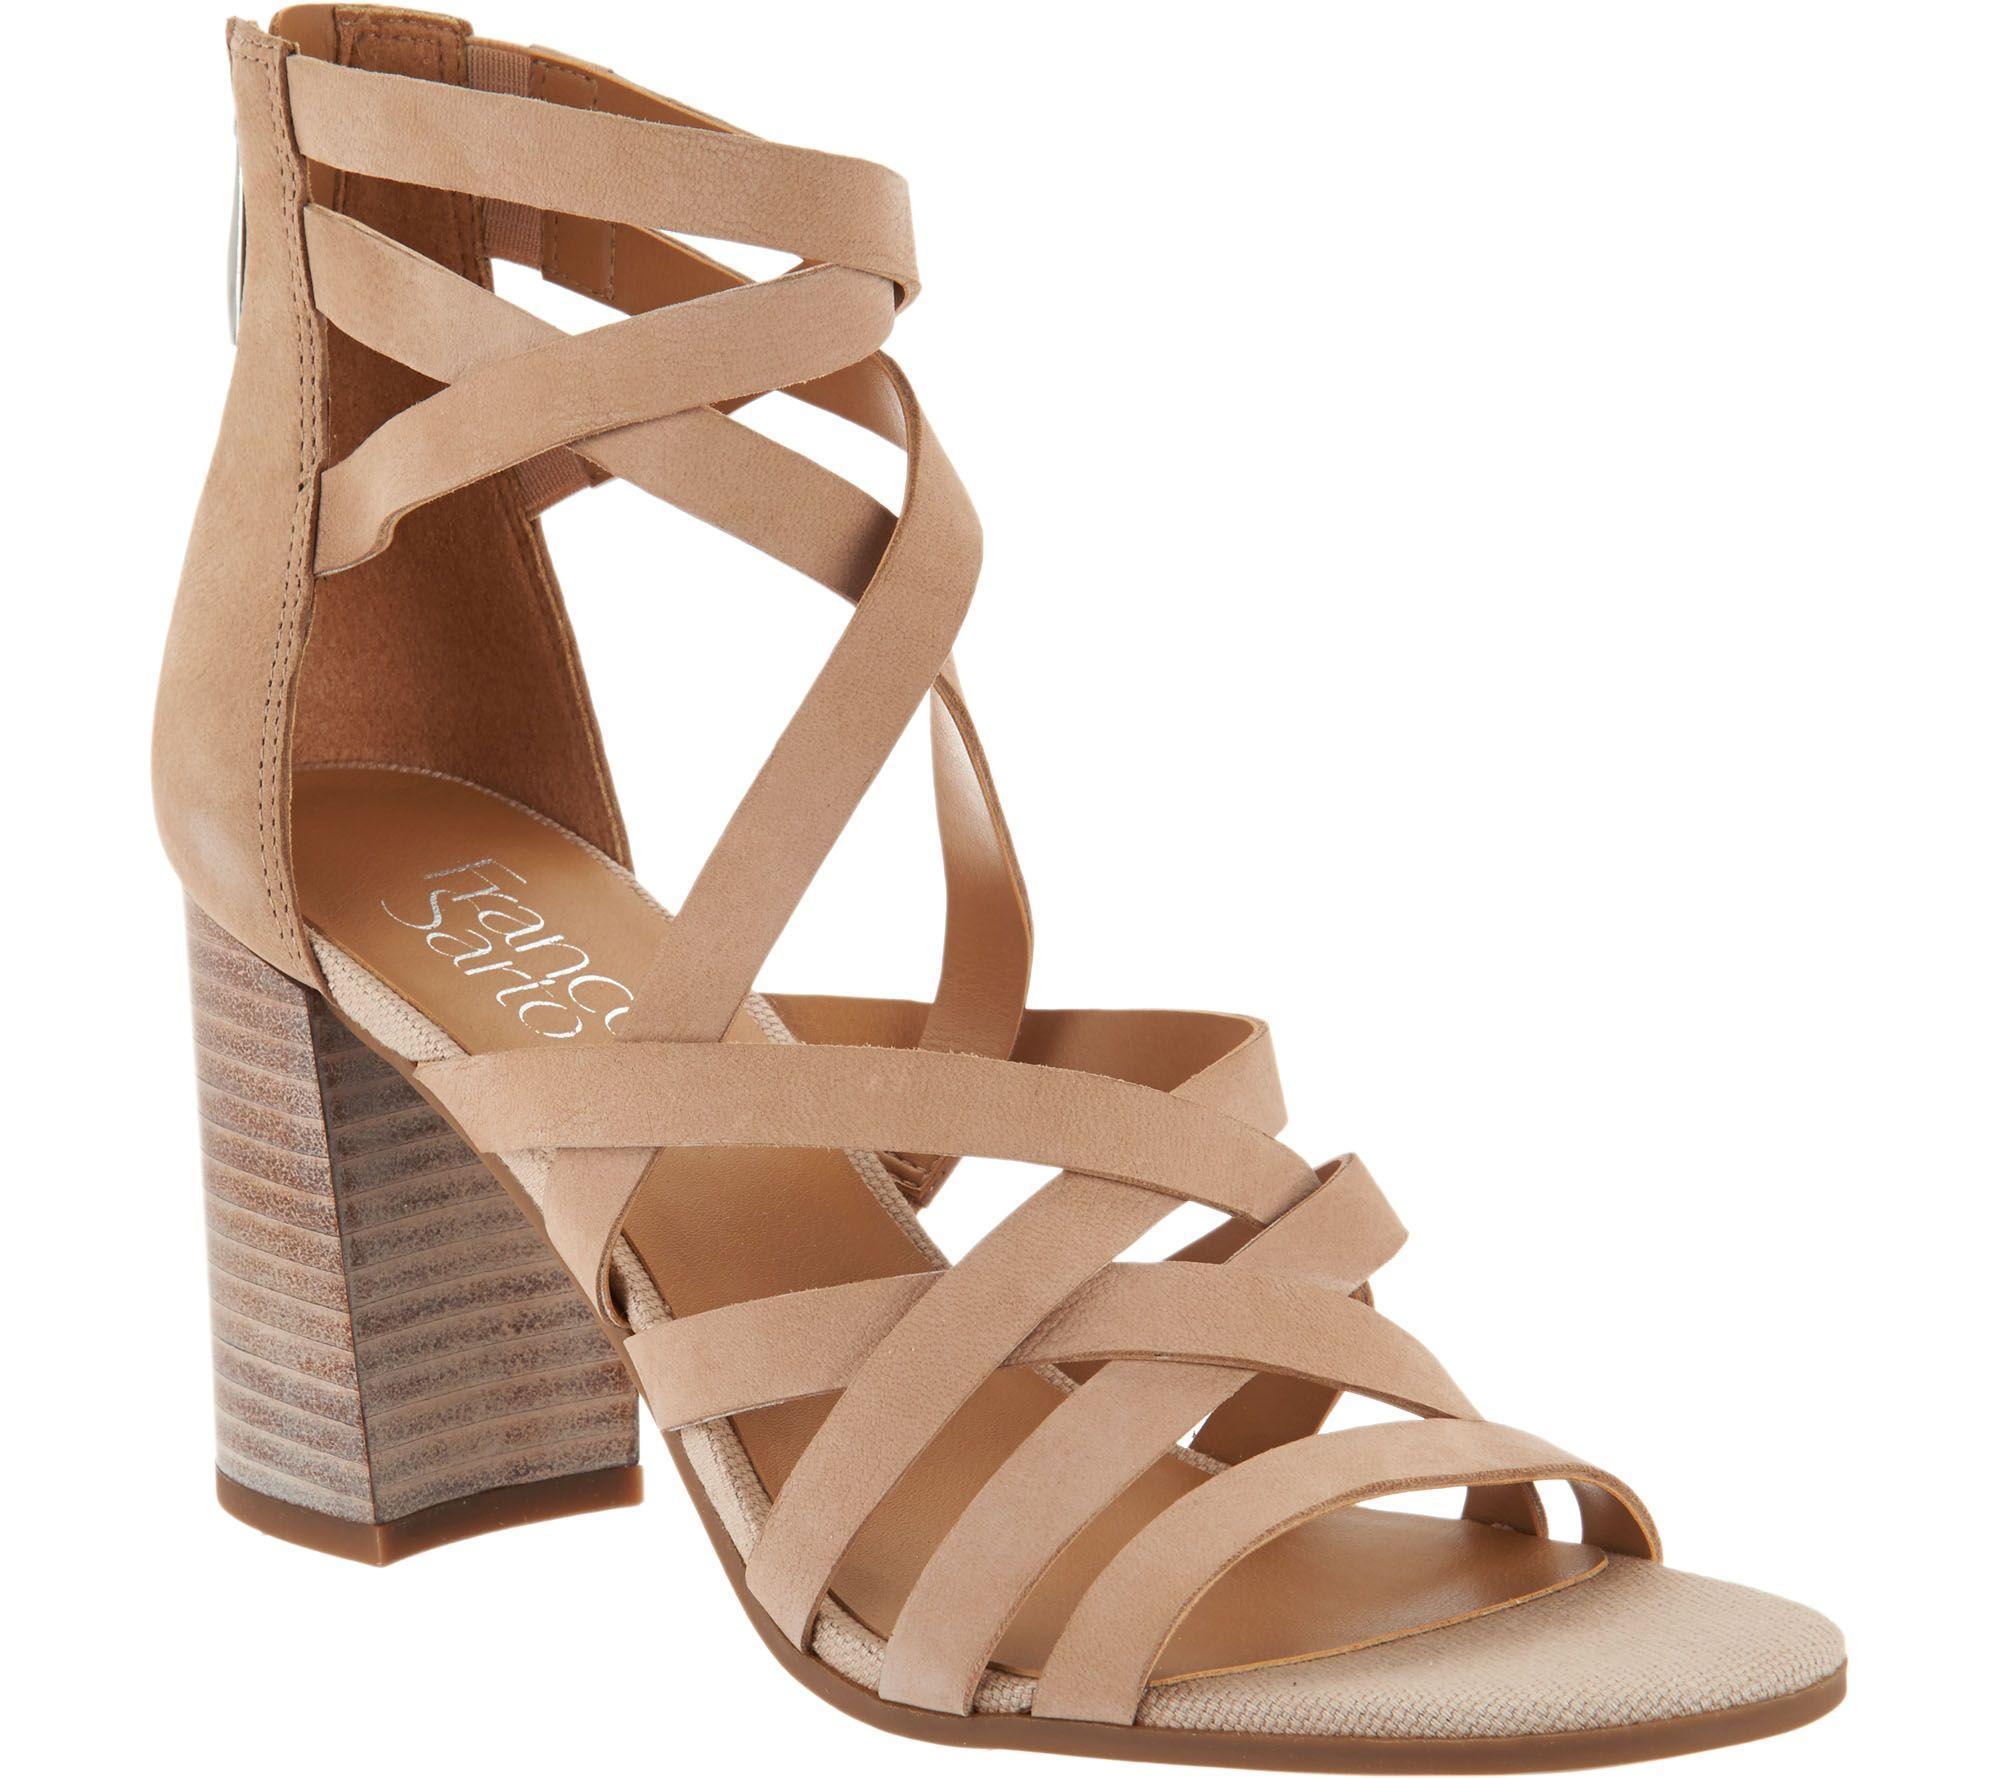 7c2441ad56 Franco Sarto Leather Block Heel Sandals - Madrid - Page 1 — QVC.com